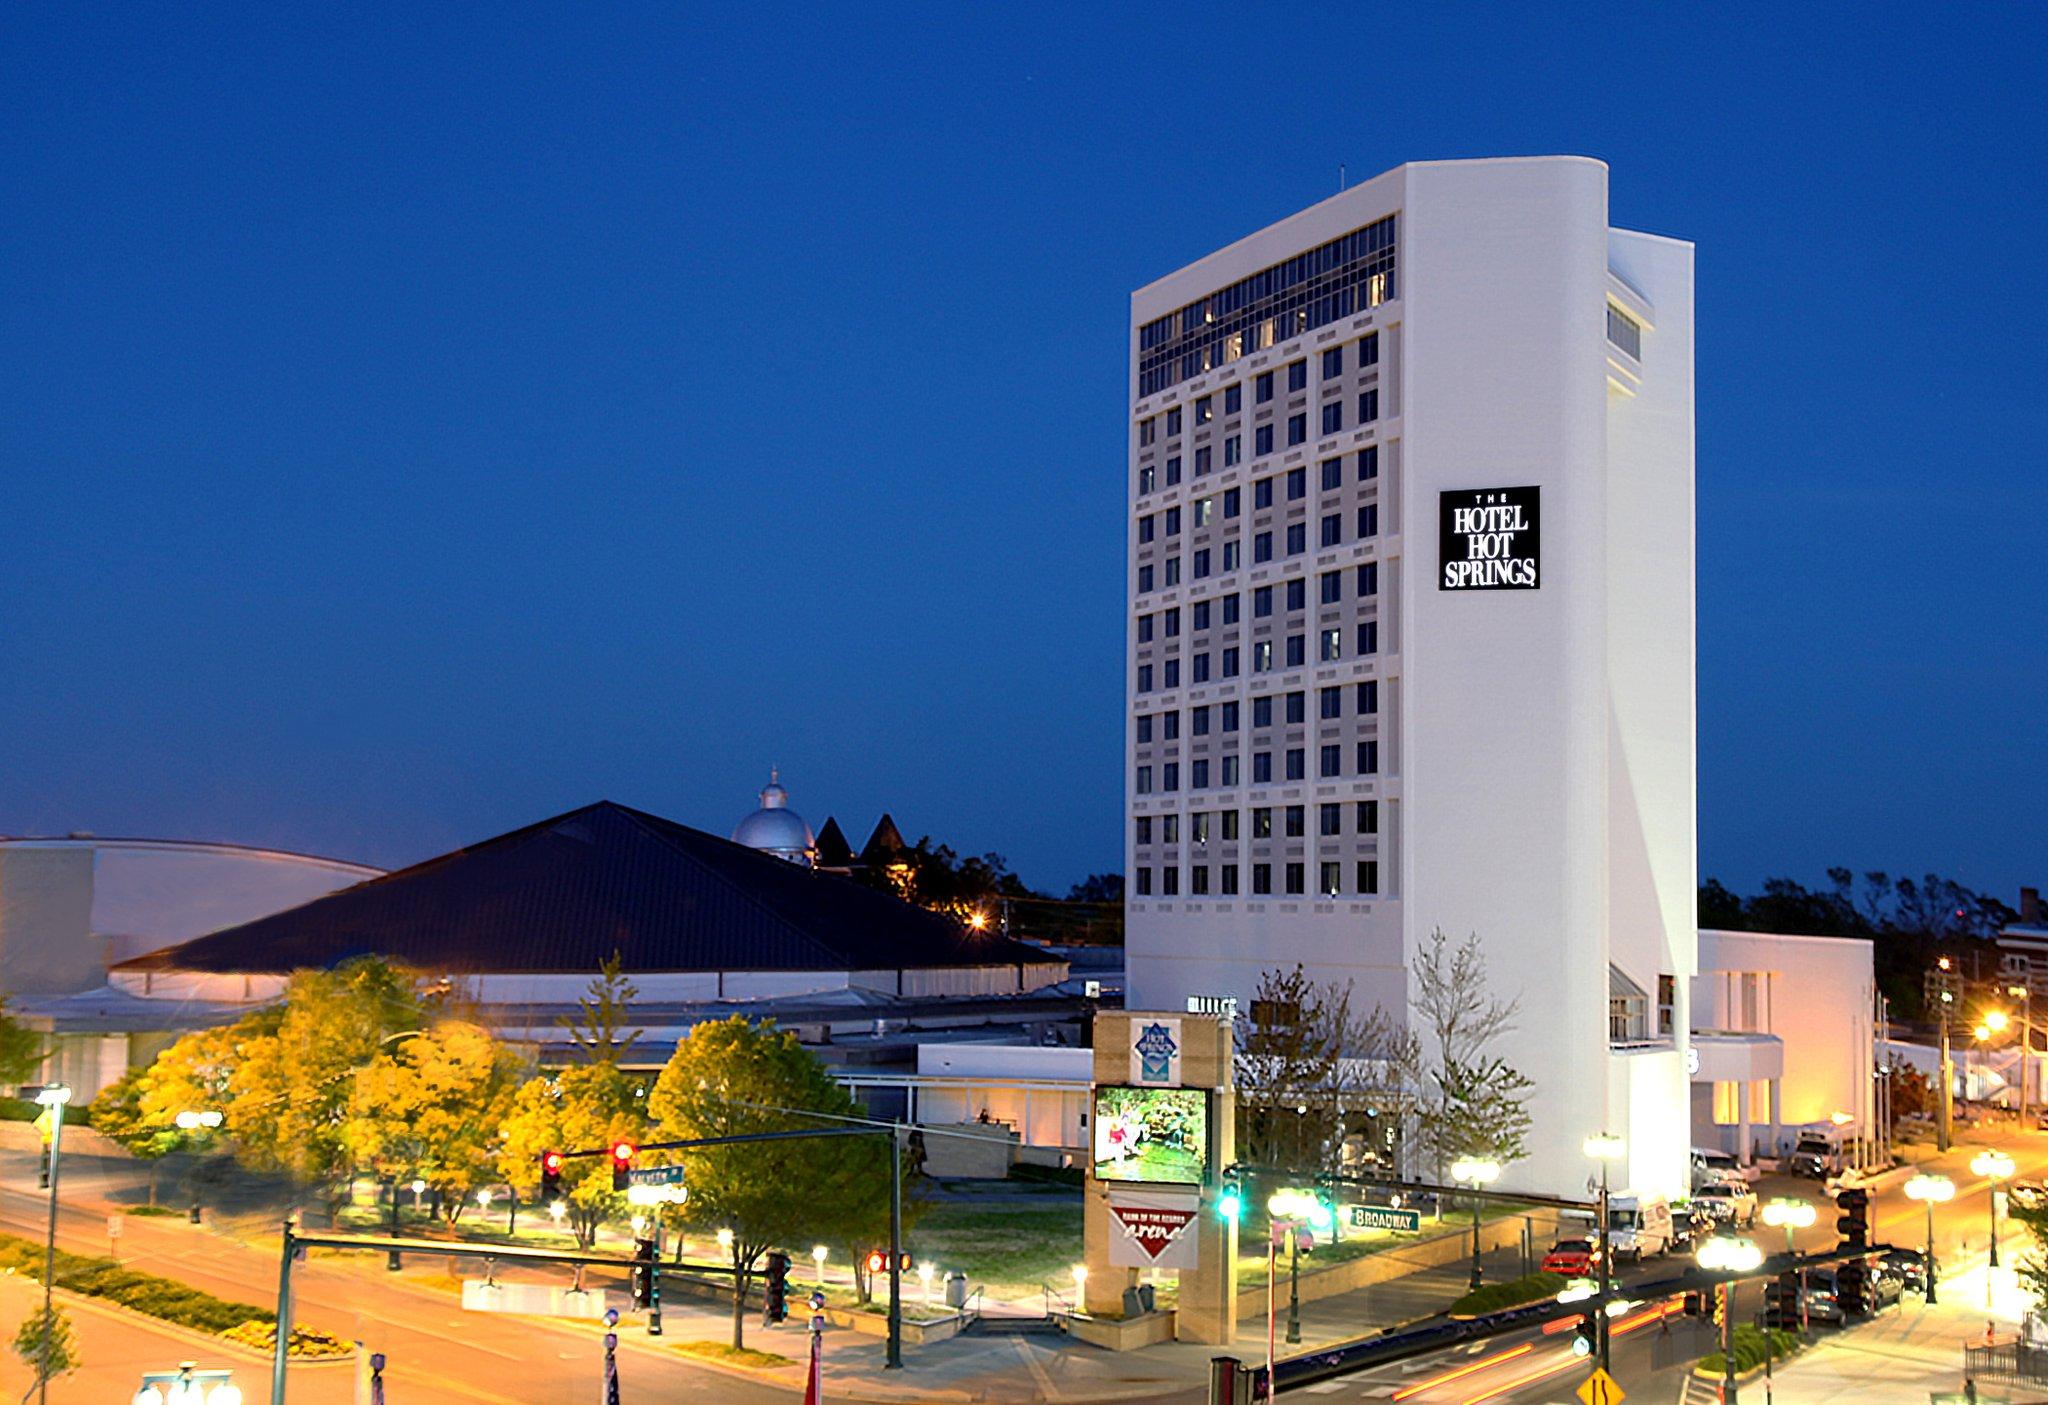 Hotel Hot Springs & Spa at the Conv Ctr